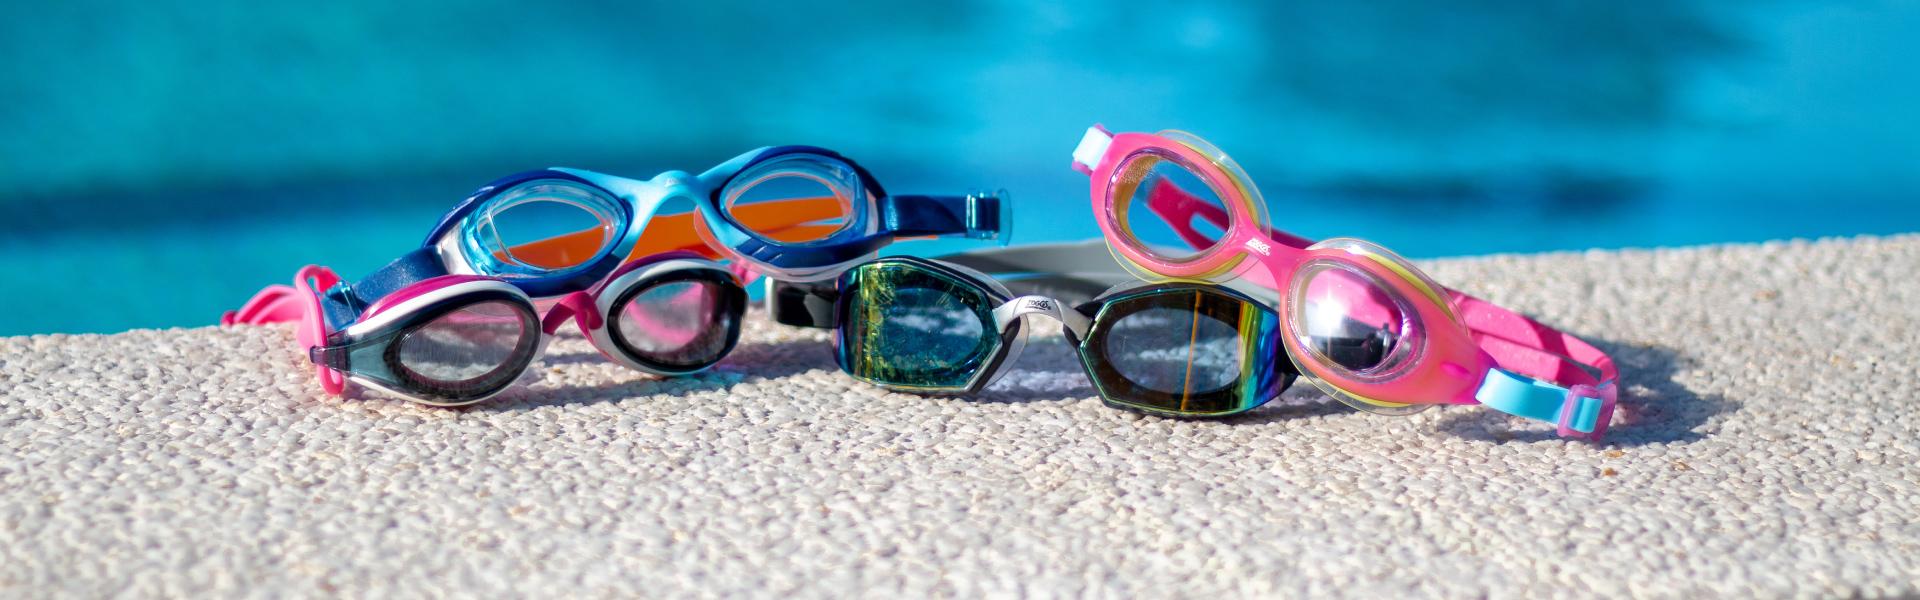 Discover the new Ultima Air Titanium goggles